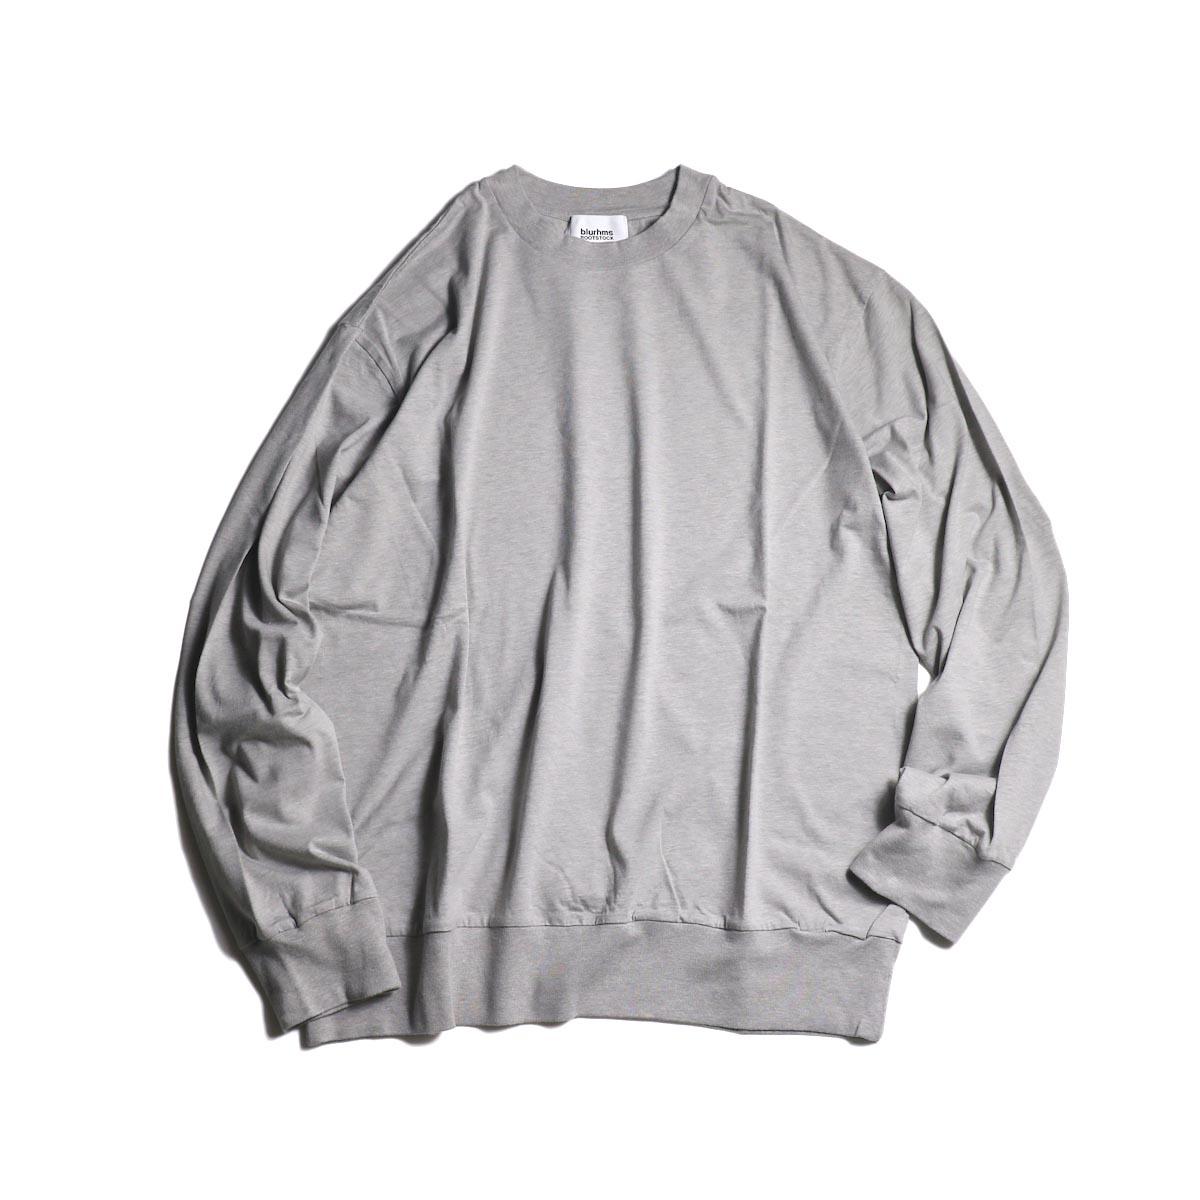 blurhms / Silk Cotton Jersey L/S P/O Loose Fit (Gray)